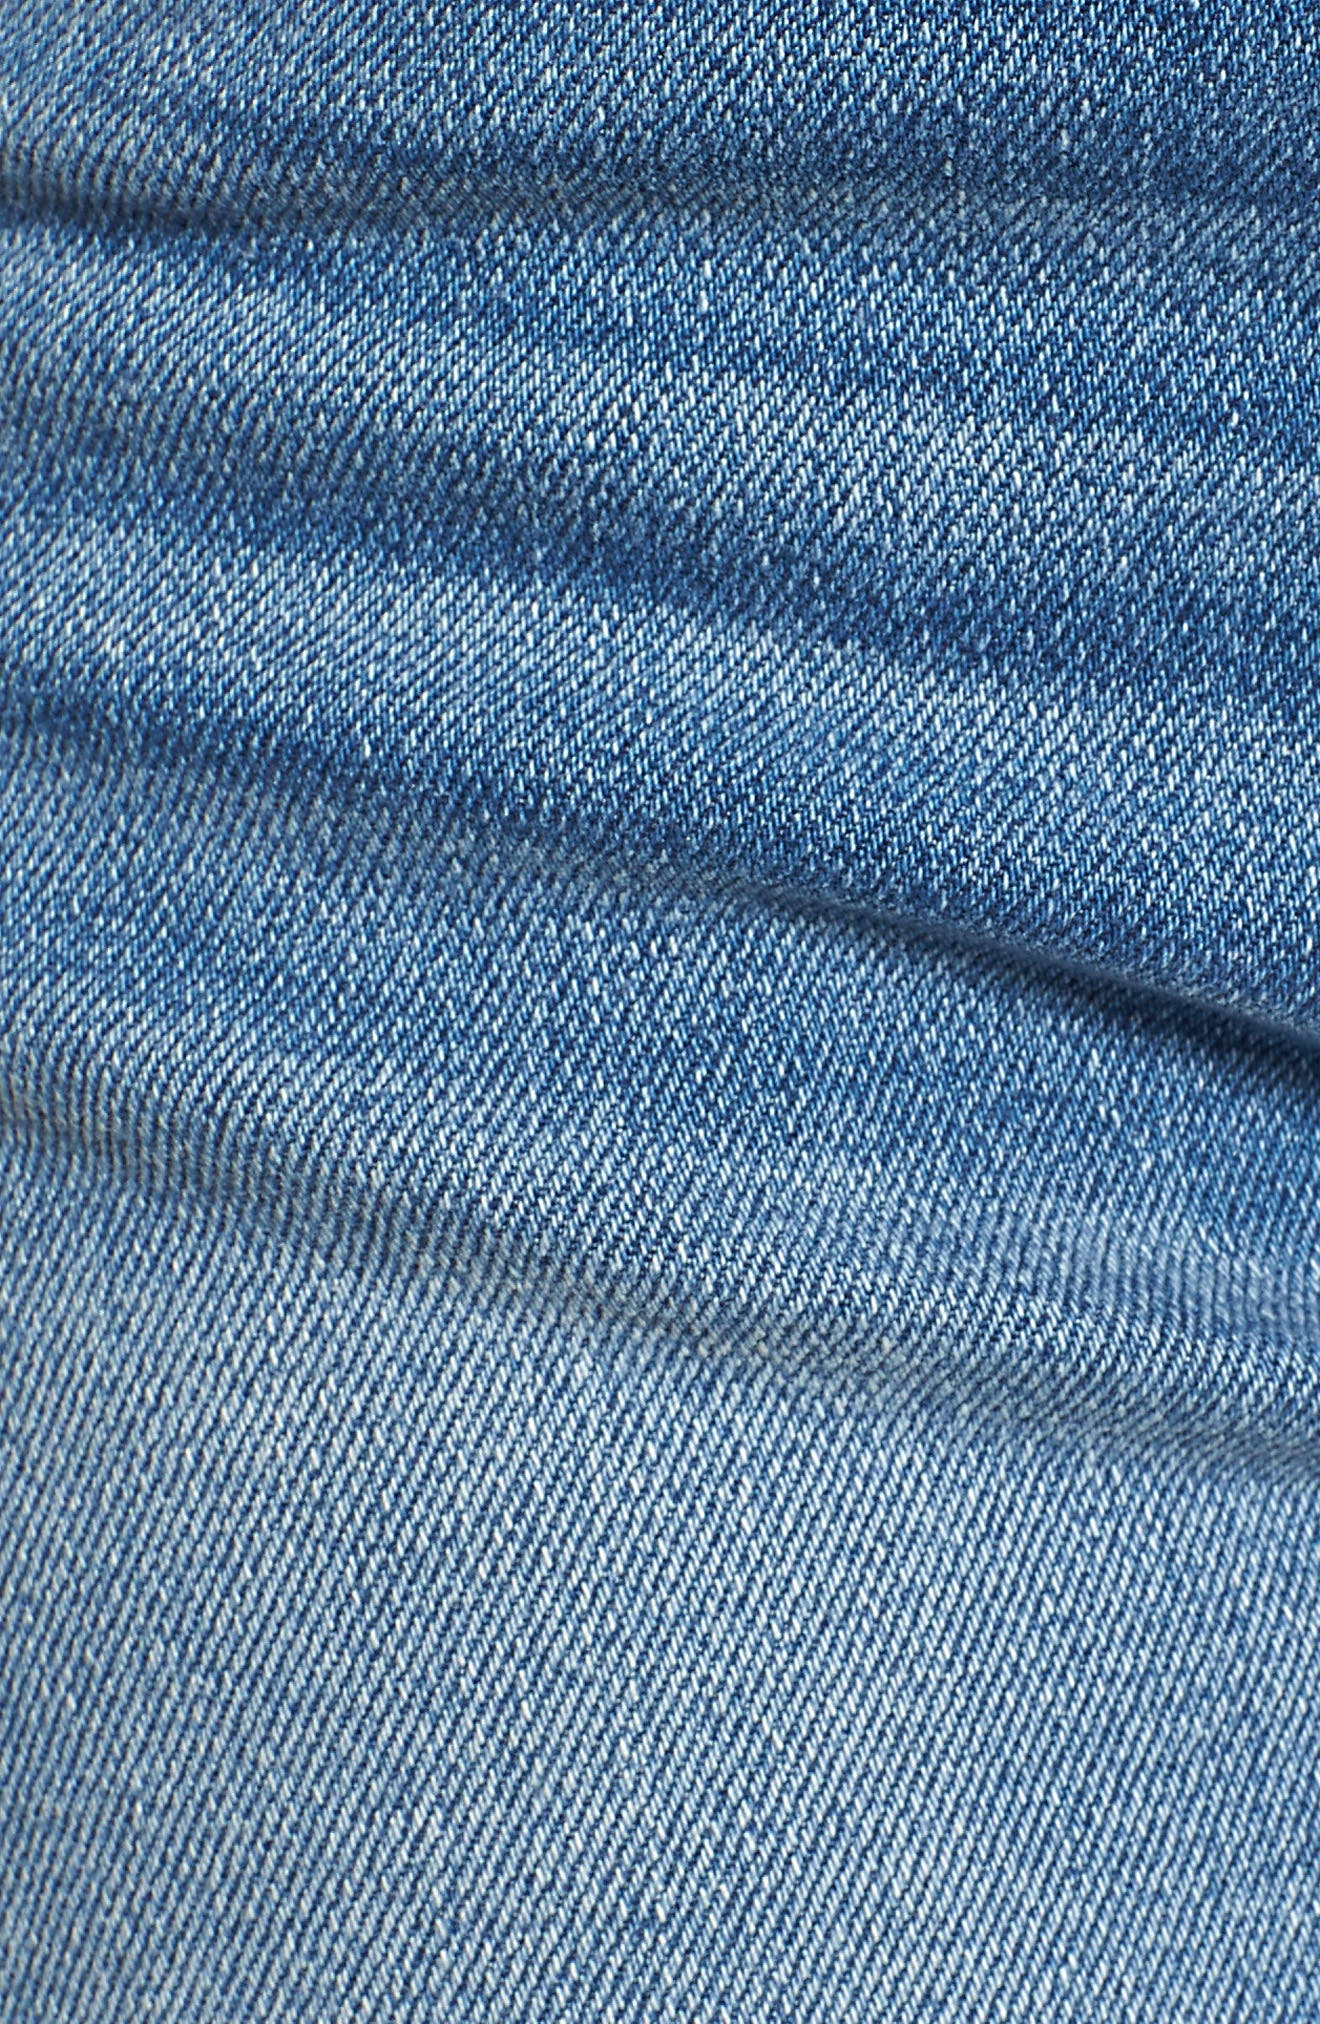 Valeri Cuff Denim Shorts,                             Alternate thumbnail 5, color,                             Proxy